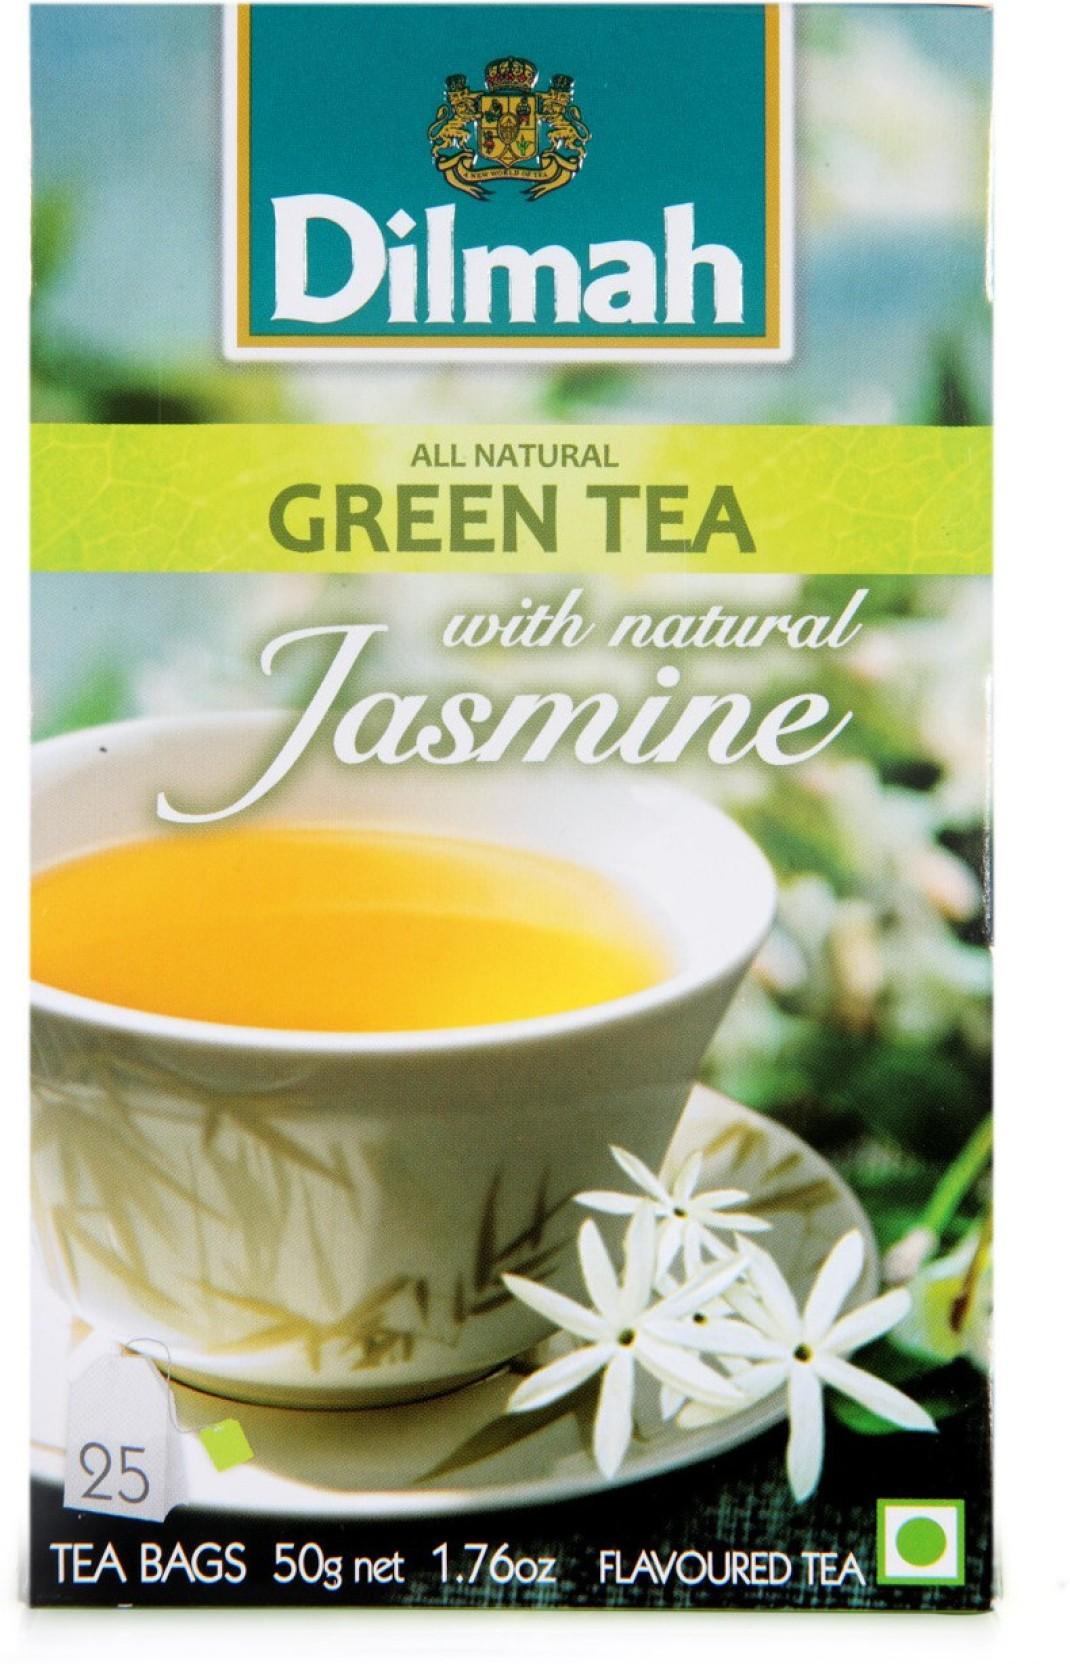 Dilmah natural jasmine green tea price in india buy dilmah natural dilmah natural jasmine green tea home izmirmasajfo